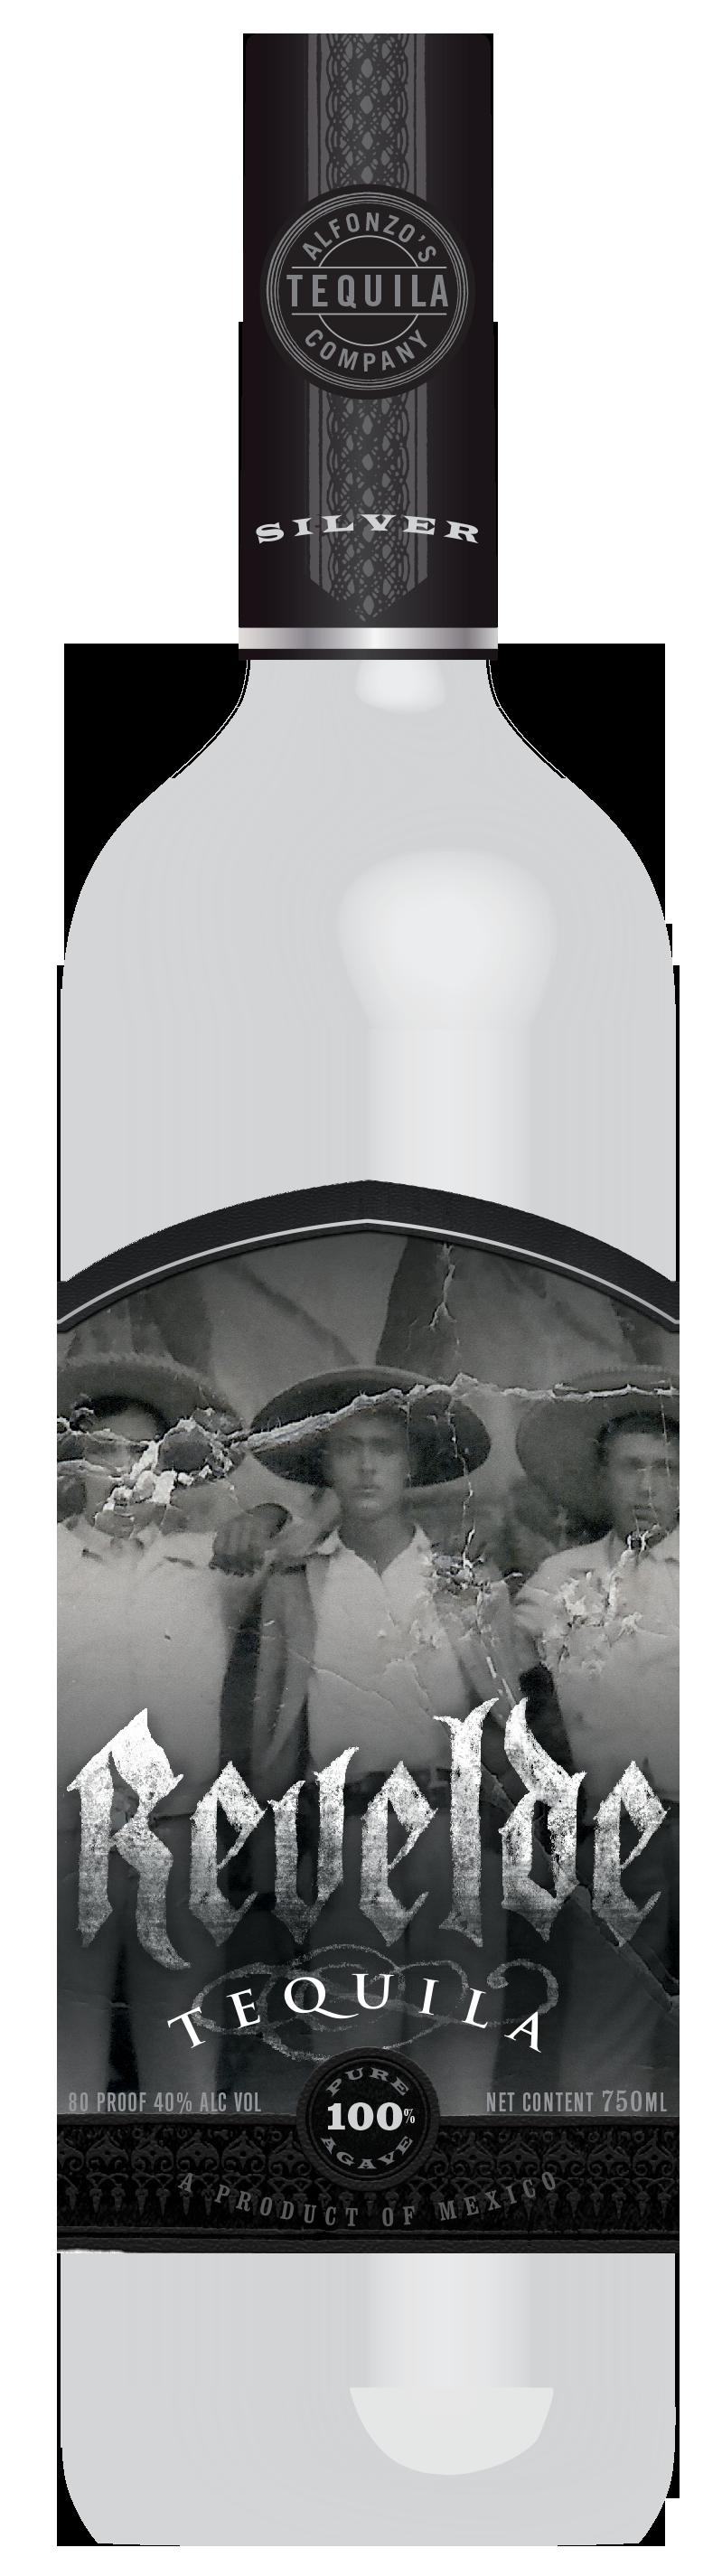 Adobe Portfolio Tequila Label HAND LETTERING Logotype dallas texas dan birlew liquor naming package design  new product launch Spirits